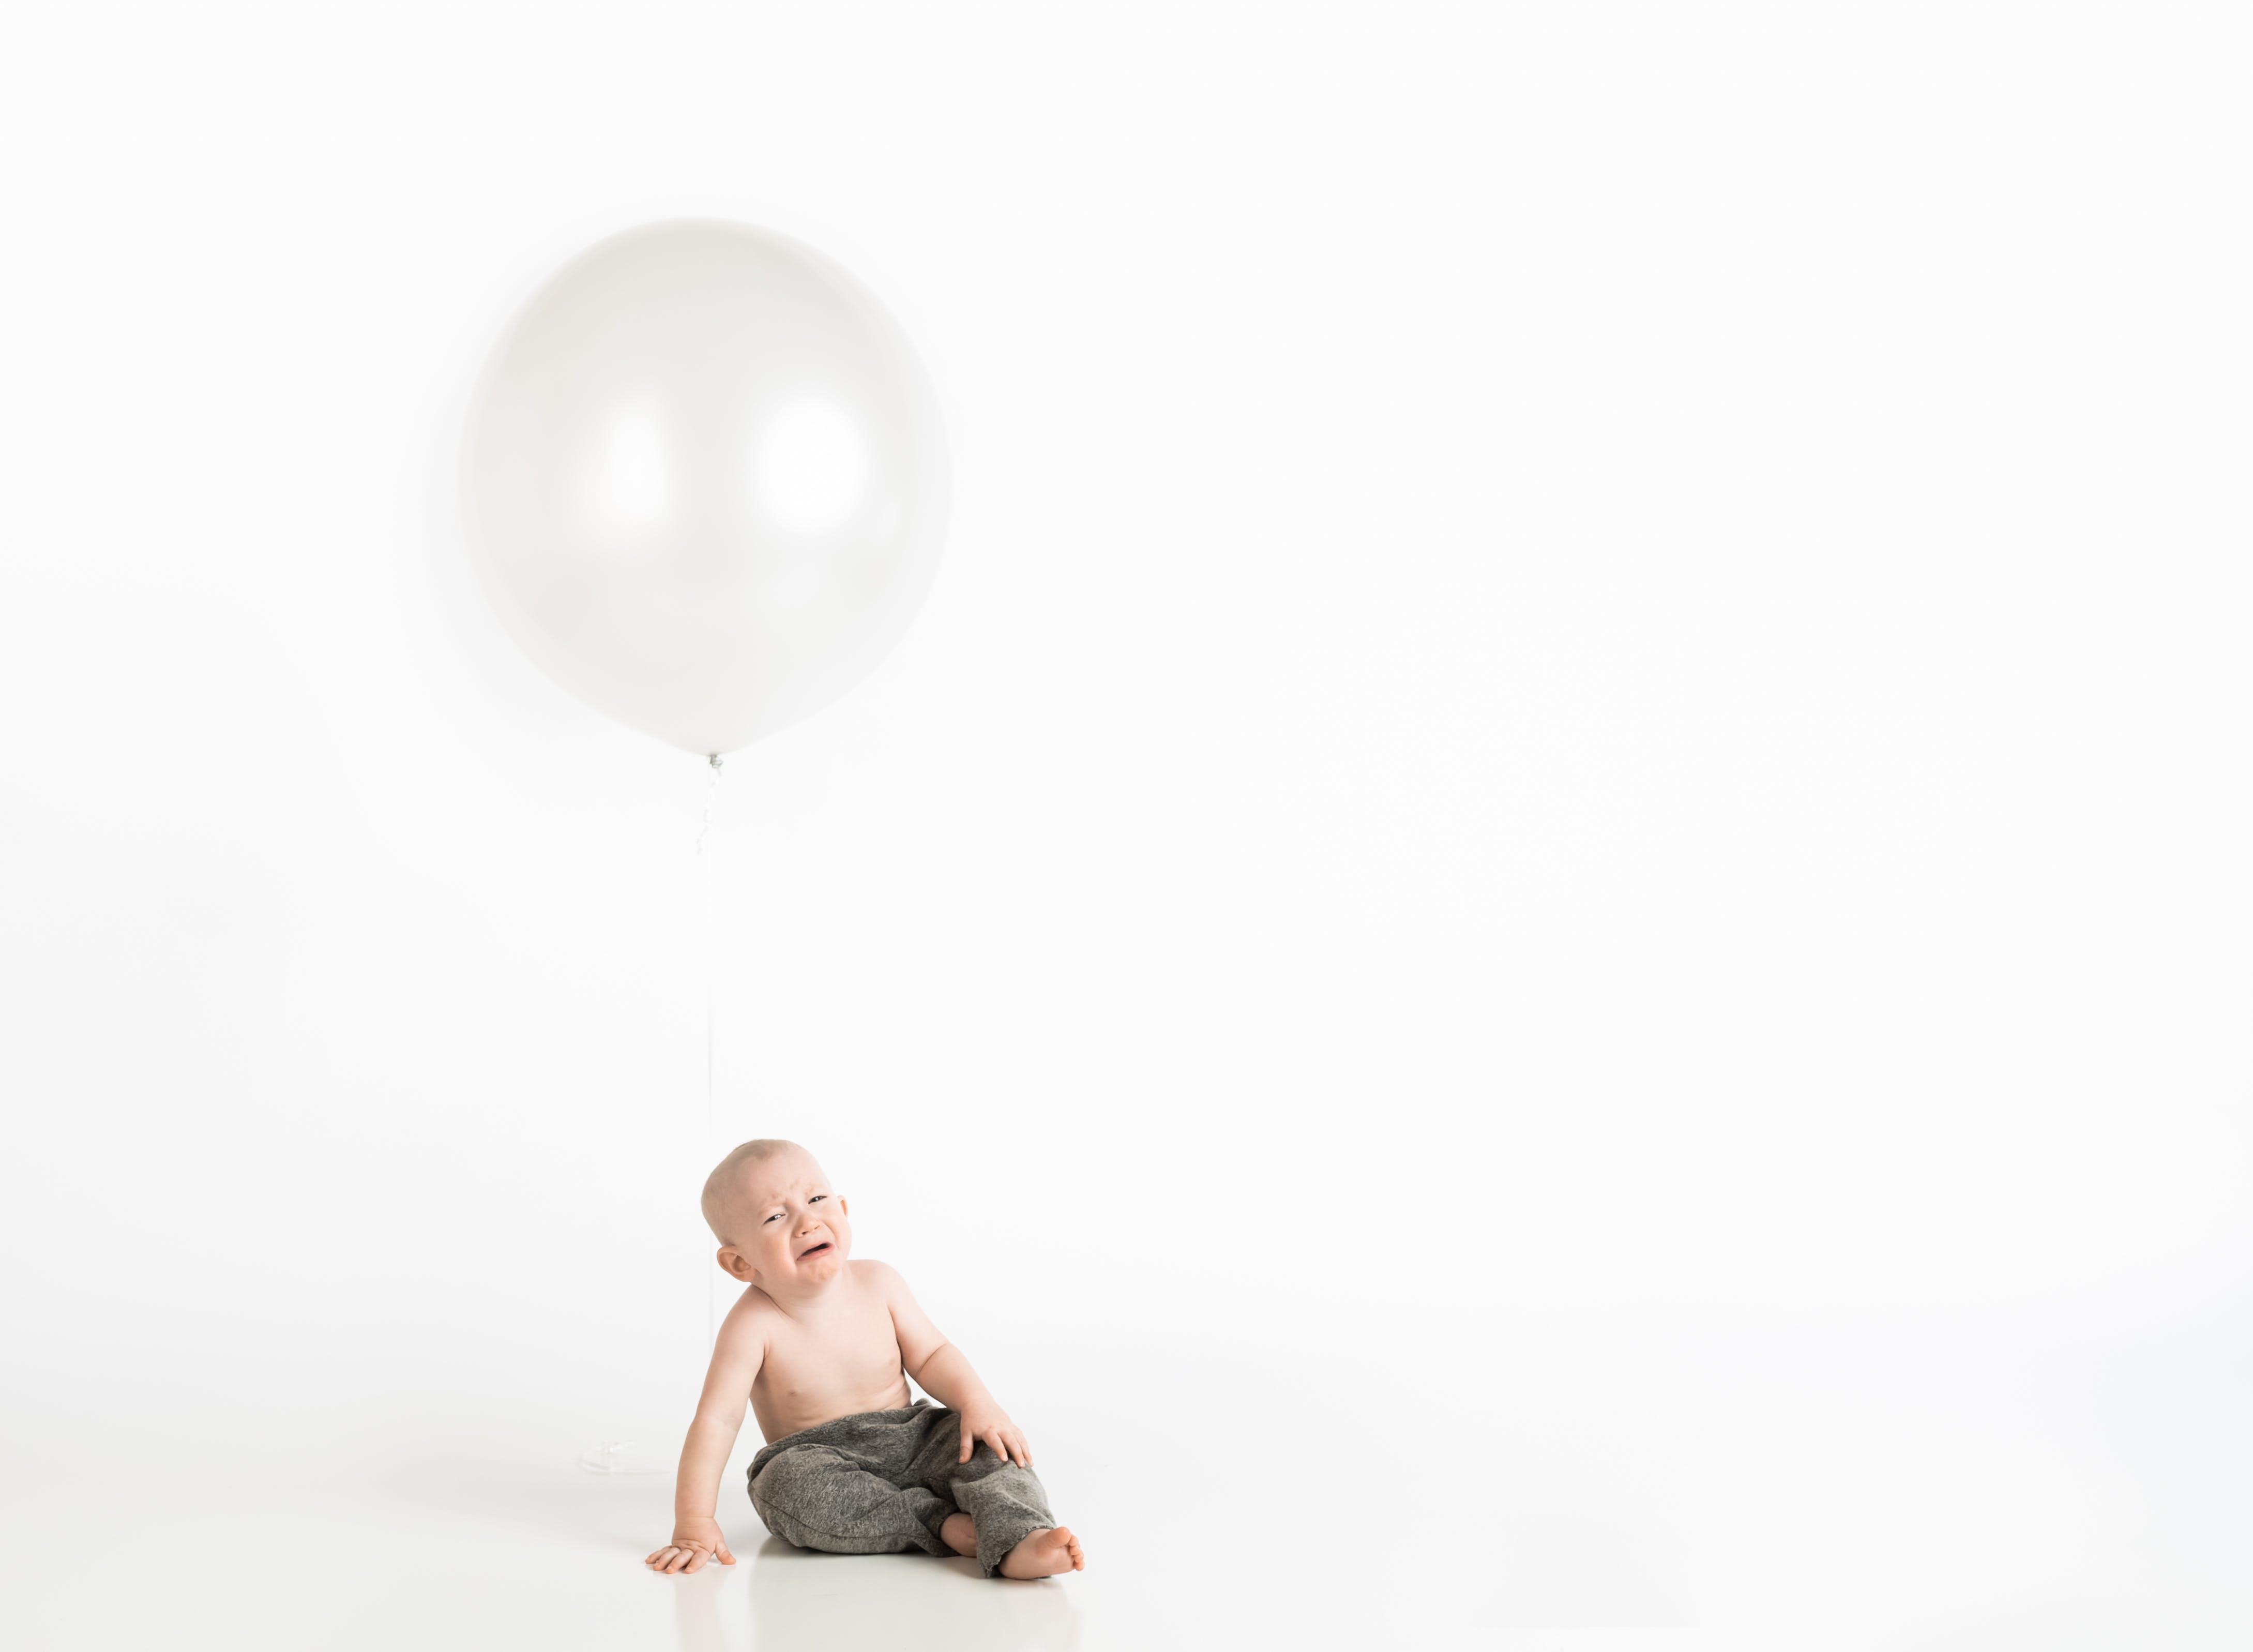 Baby Sitting on Floor